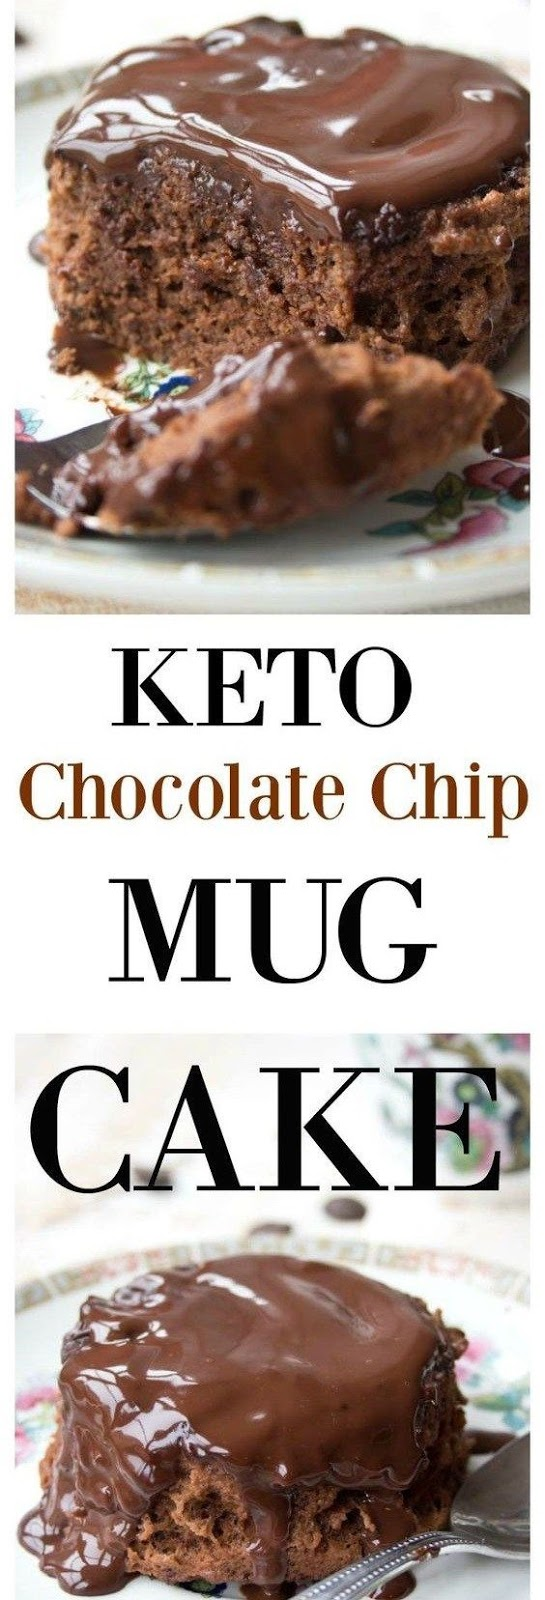 Keto chocolate chip mug cake